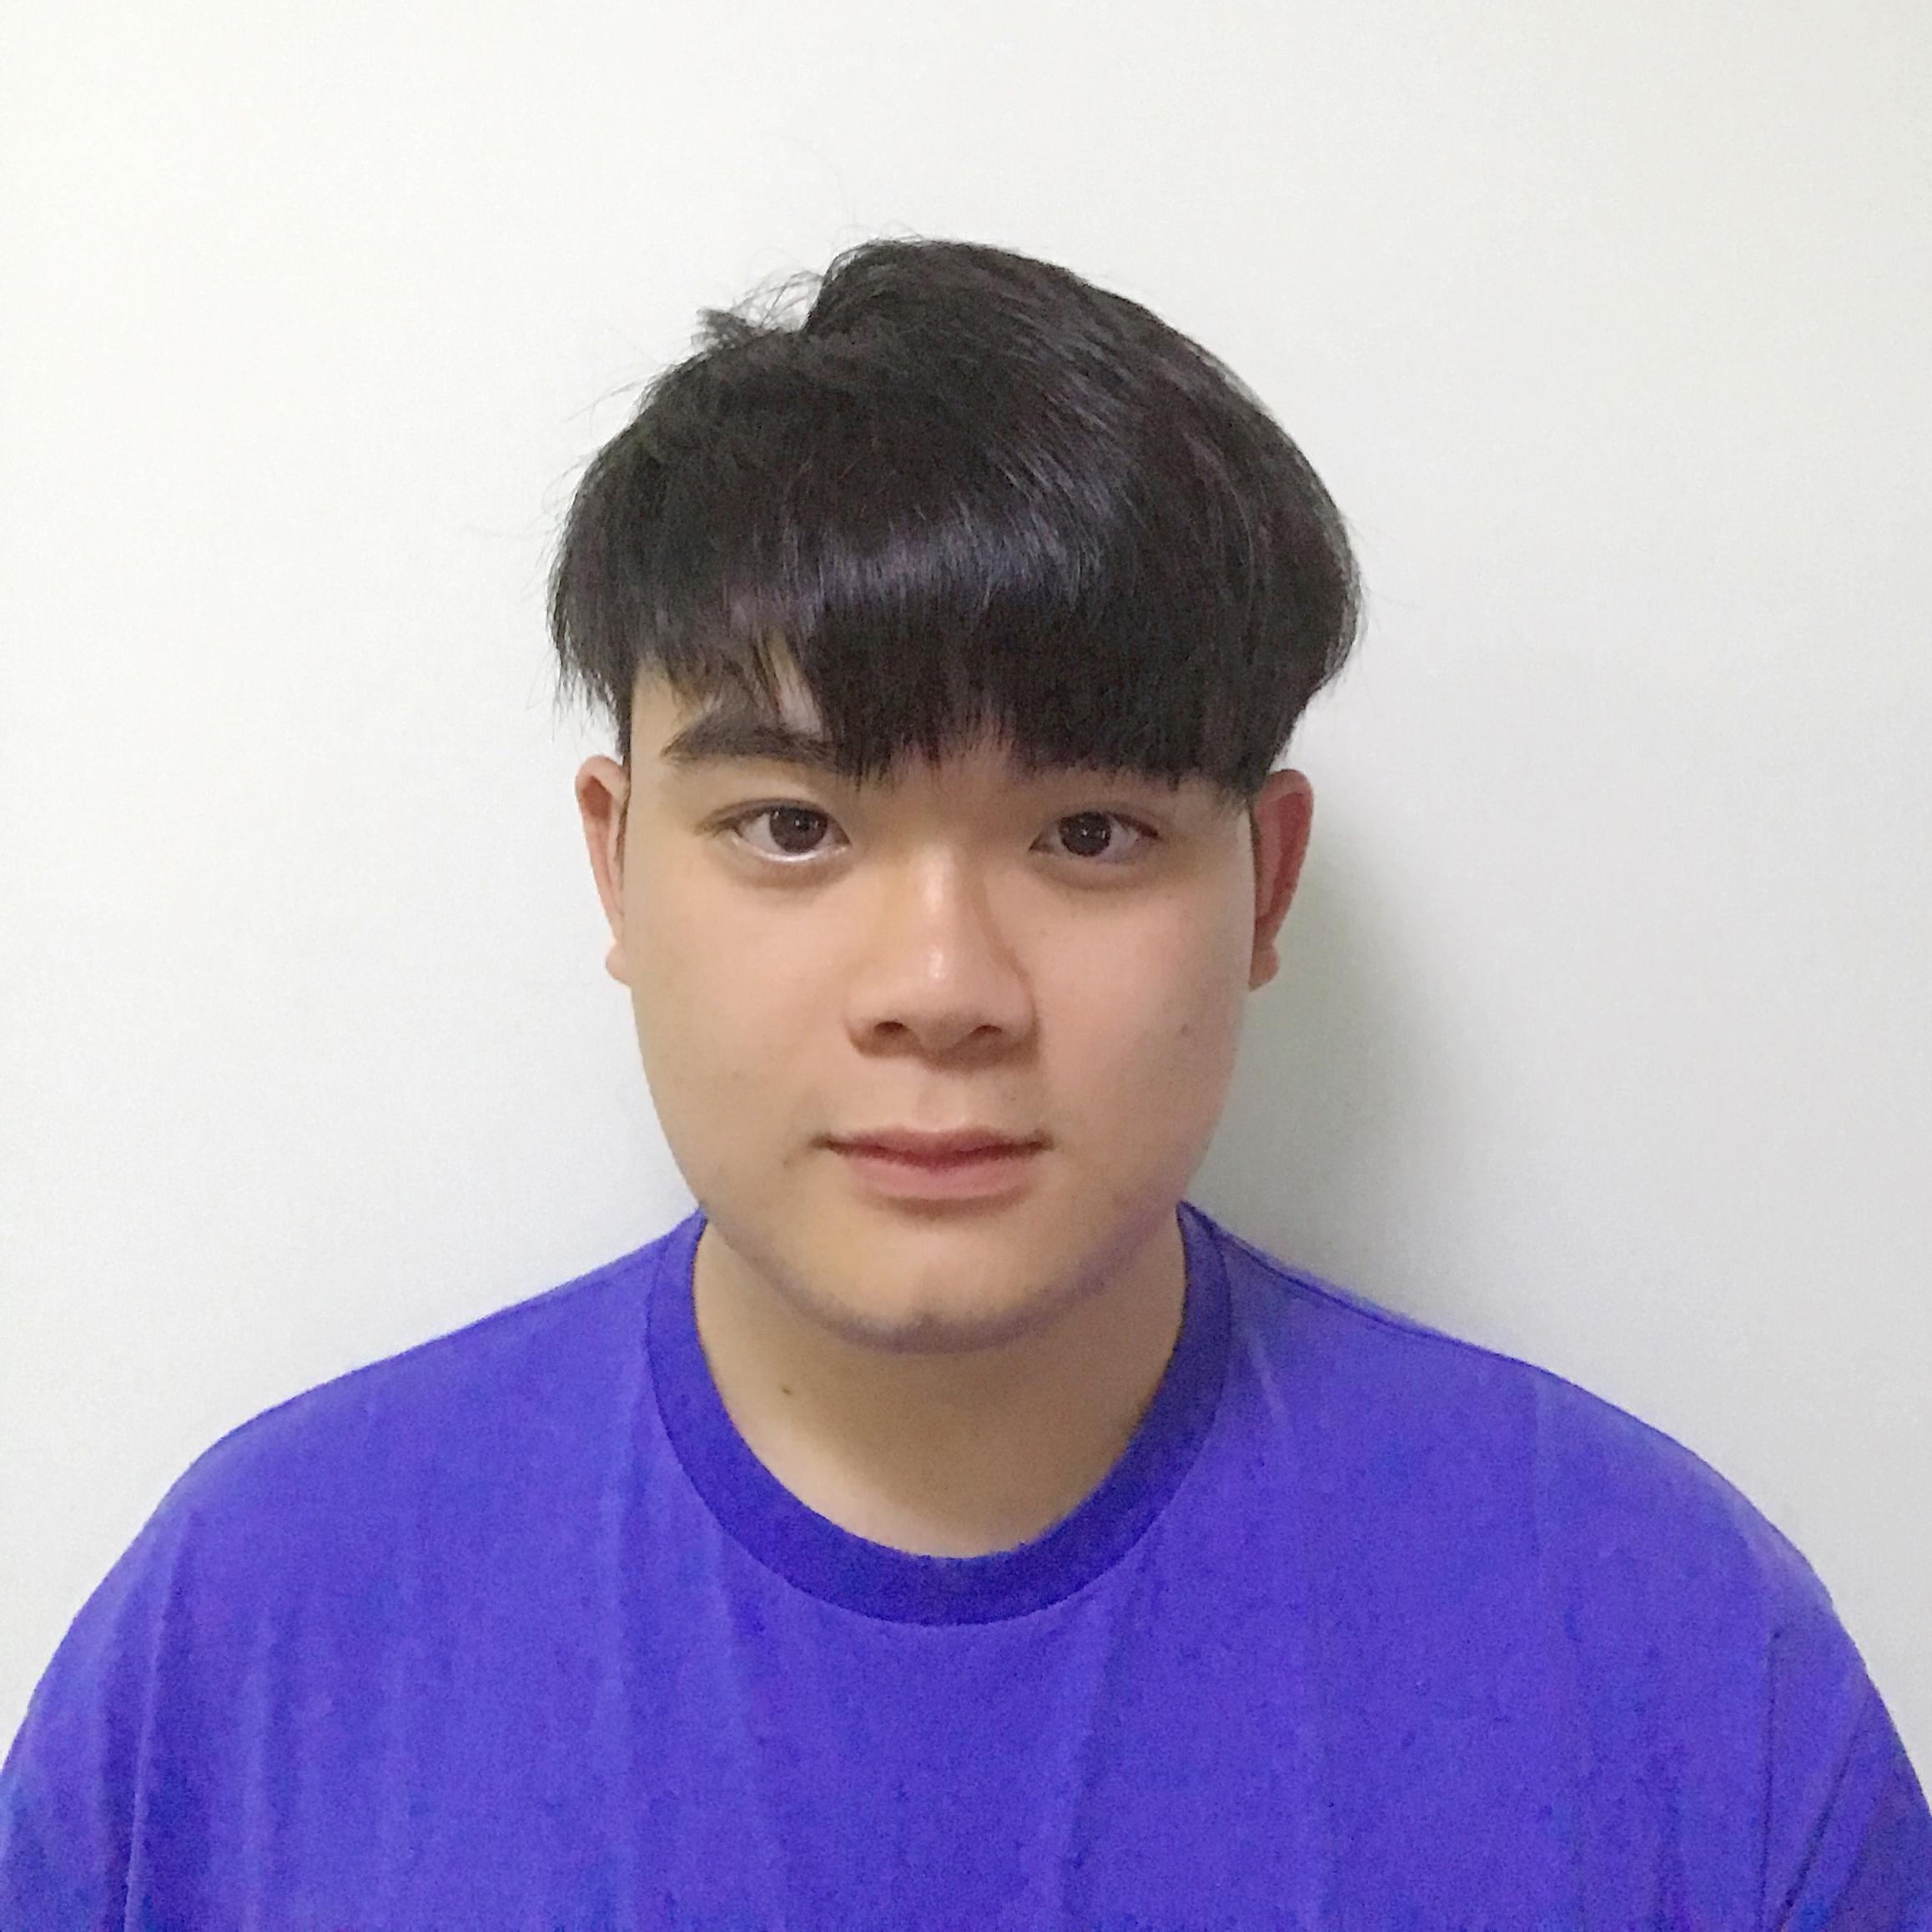 1183_LeeHin Fung Jesse_headshot.jpg